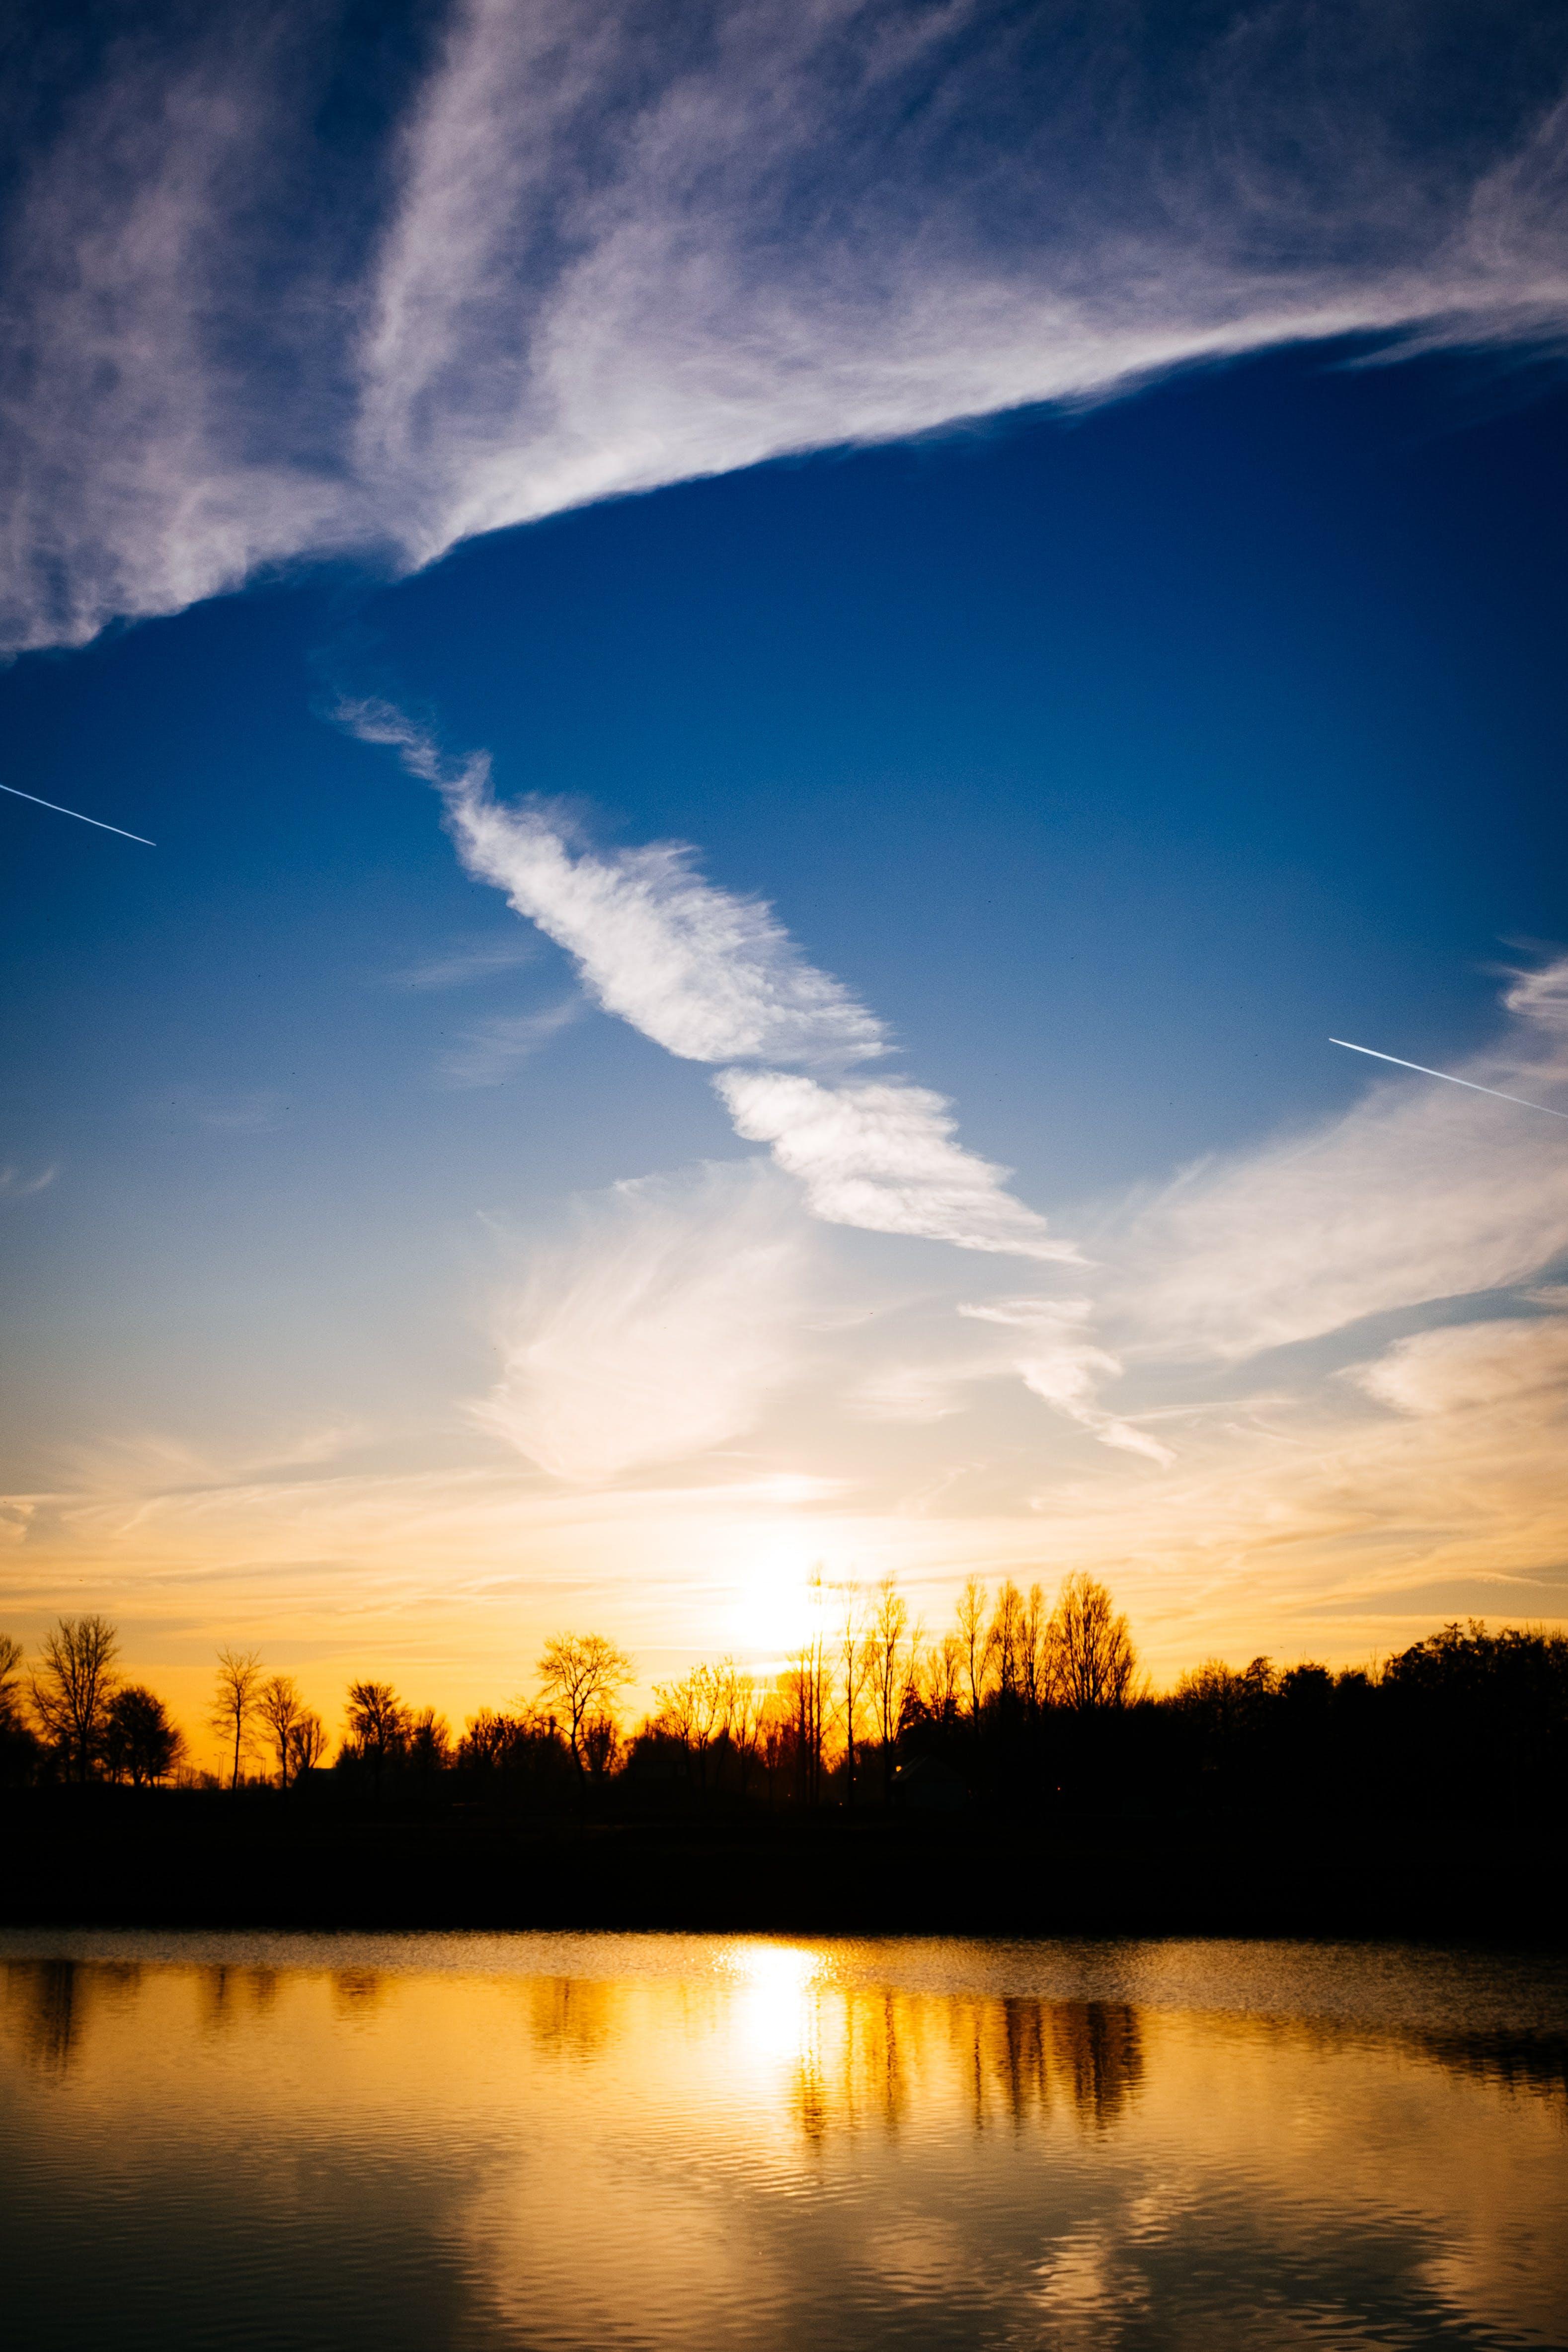 Gratis stockfoto met bomen, dageraad, h2o, hemel